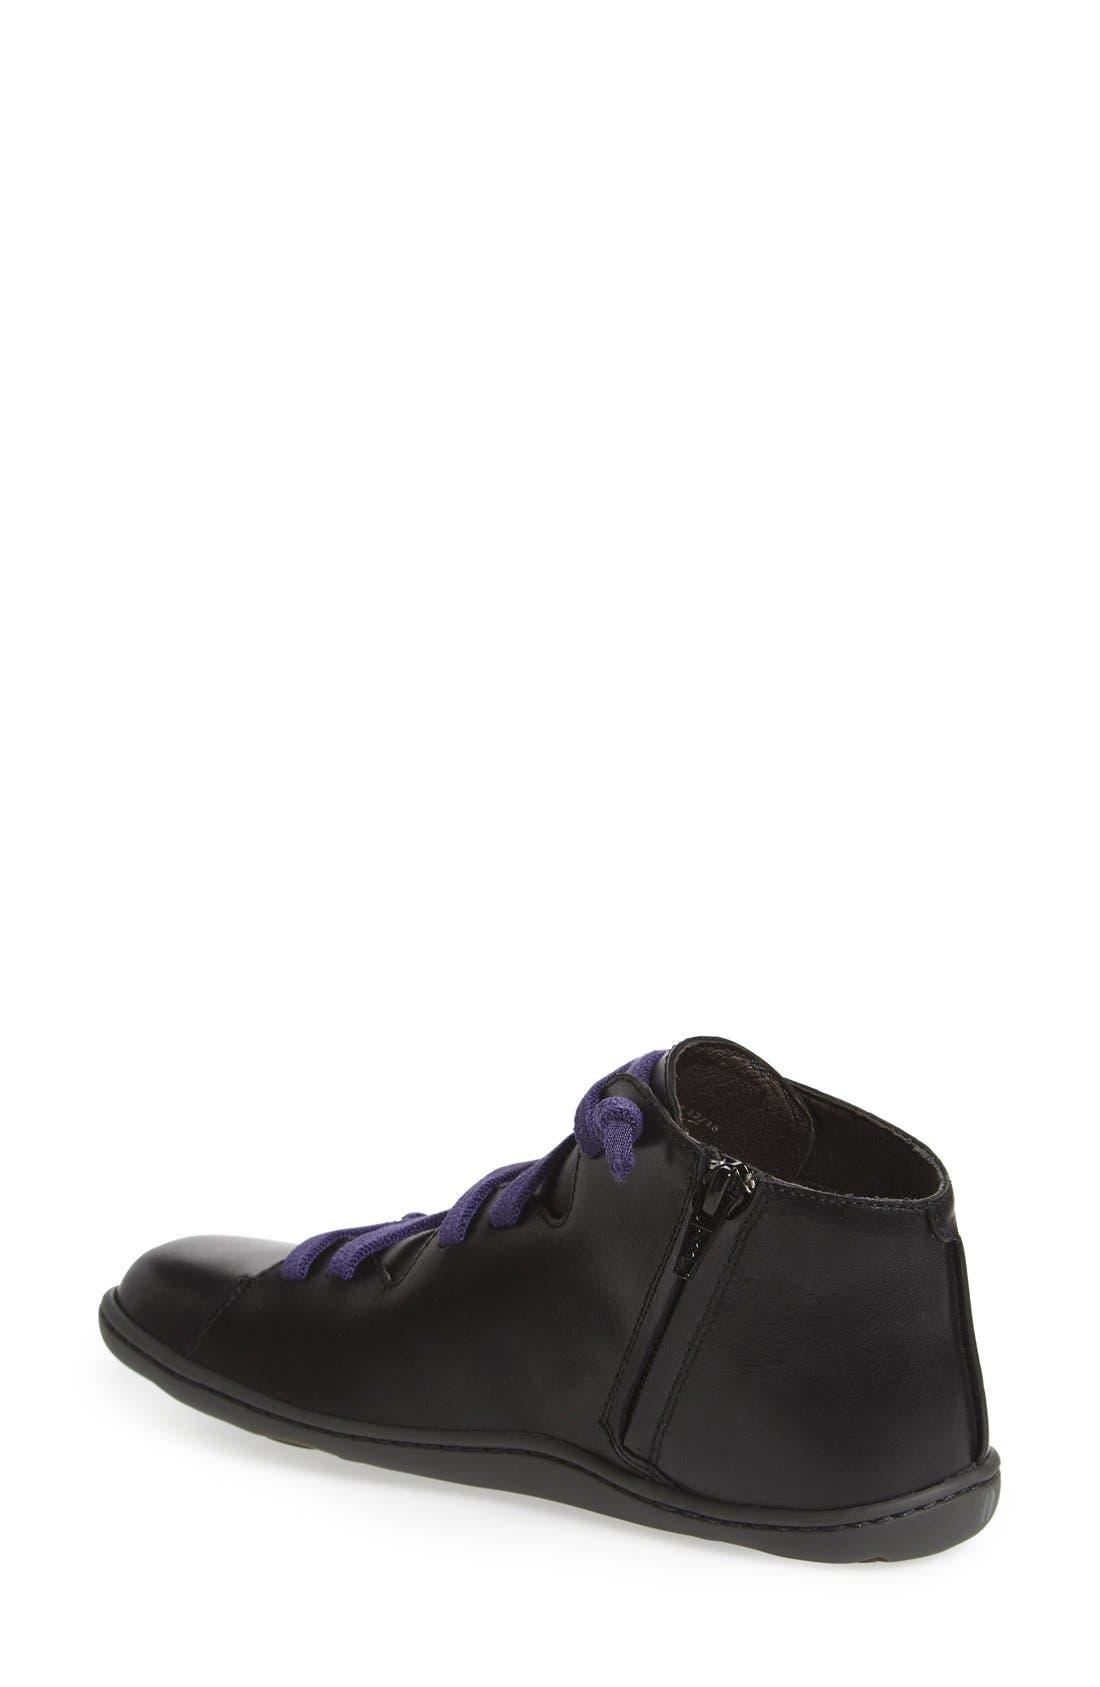 'Peu Cami' Mid Sneaker,                             Alternate thumbnail 2, color,                             BLACK LEATHER